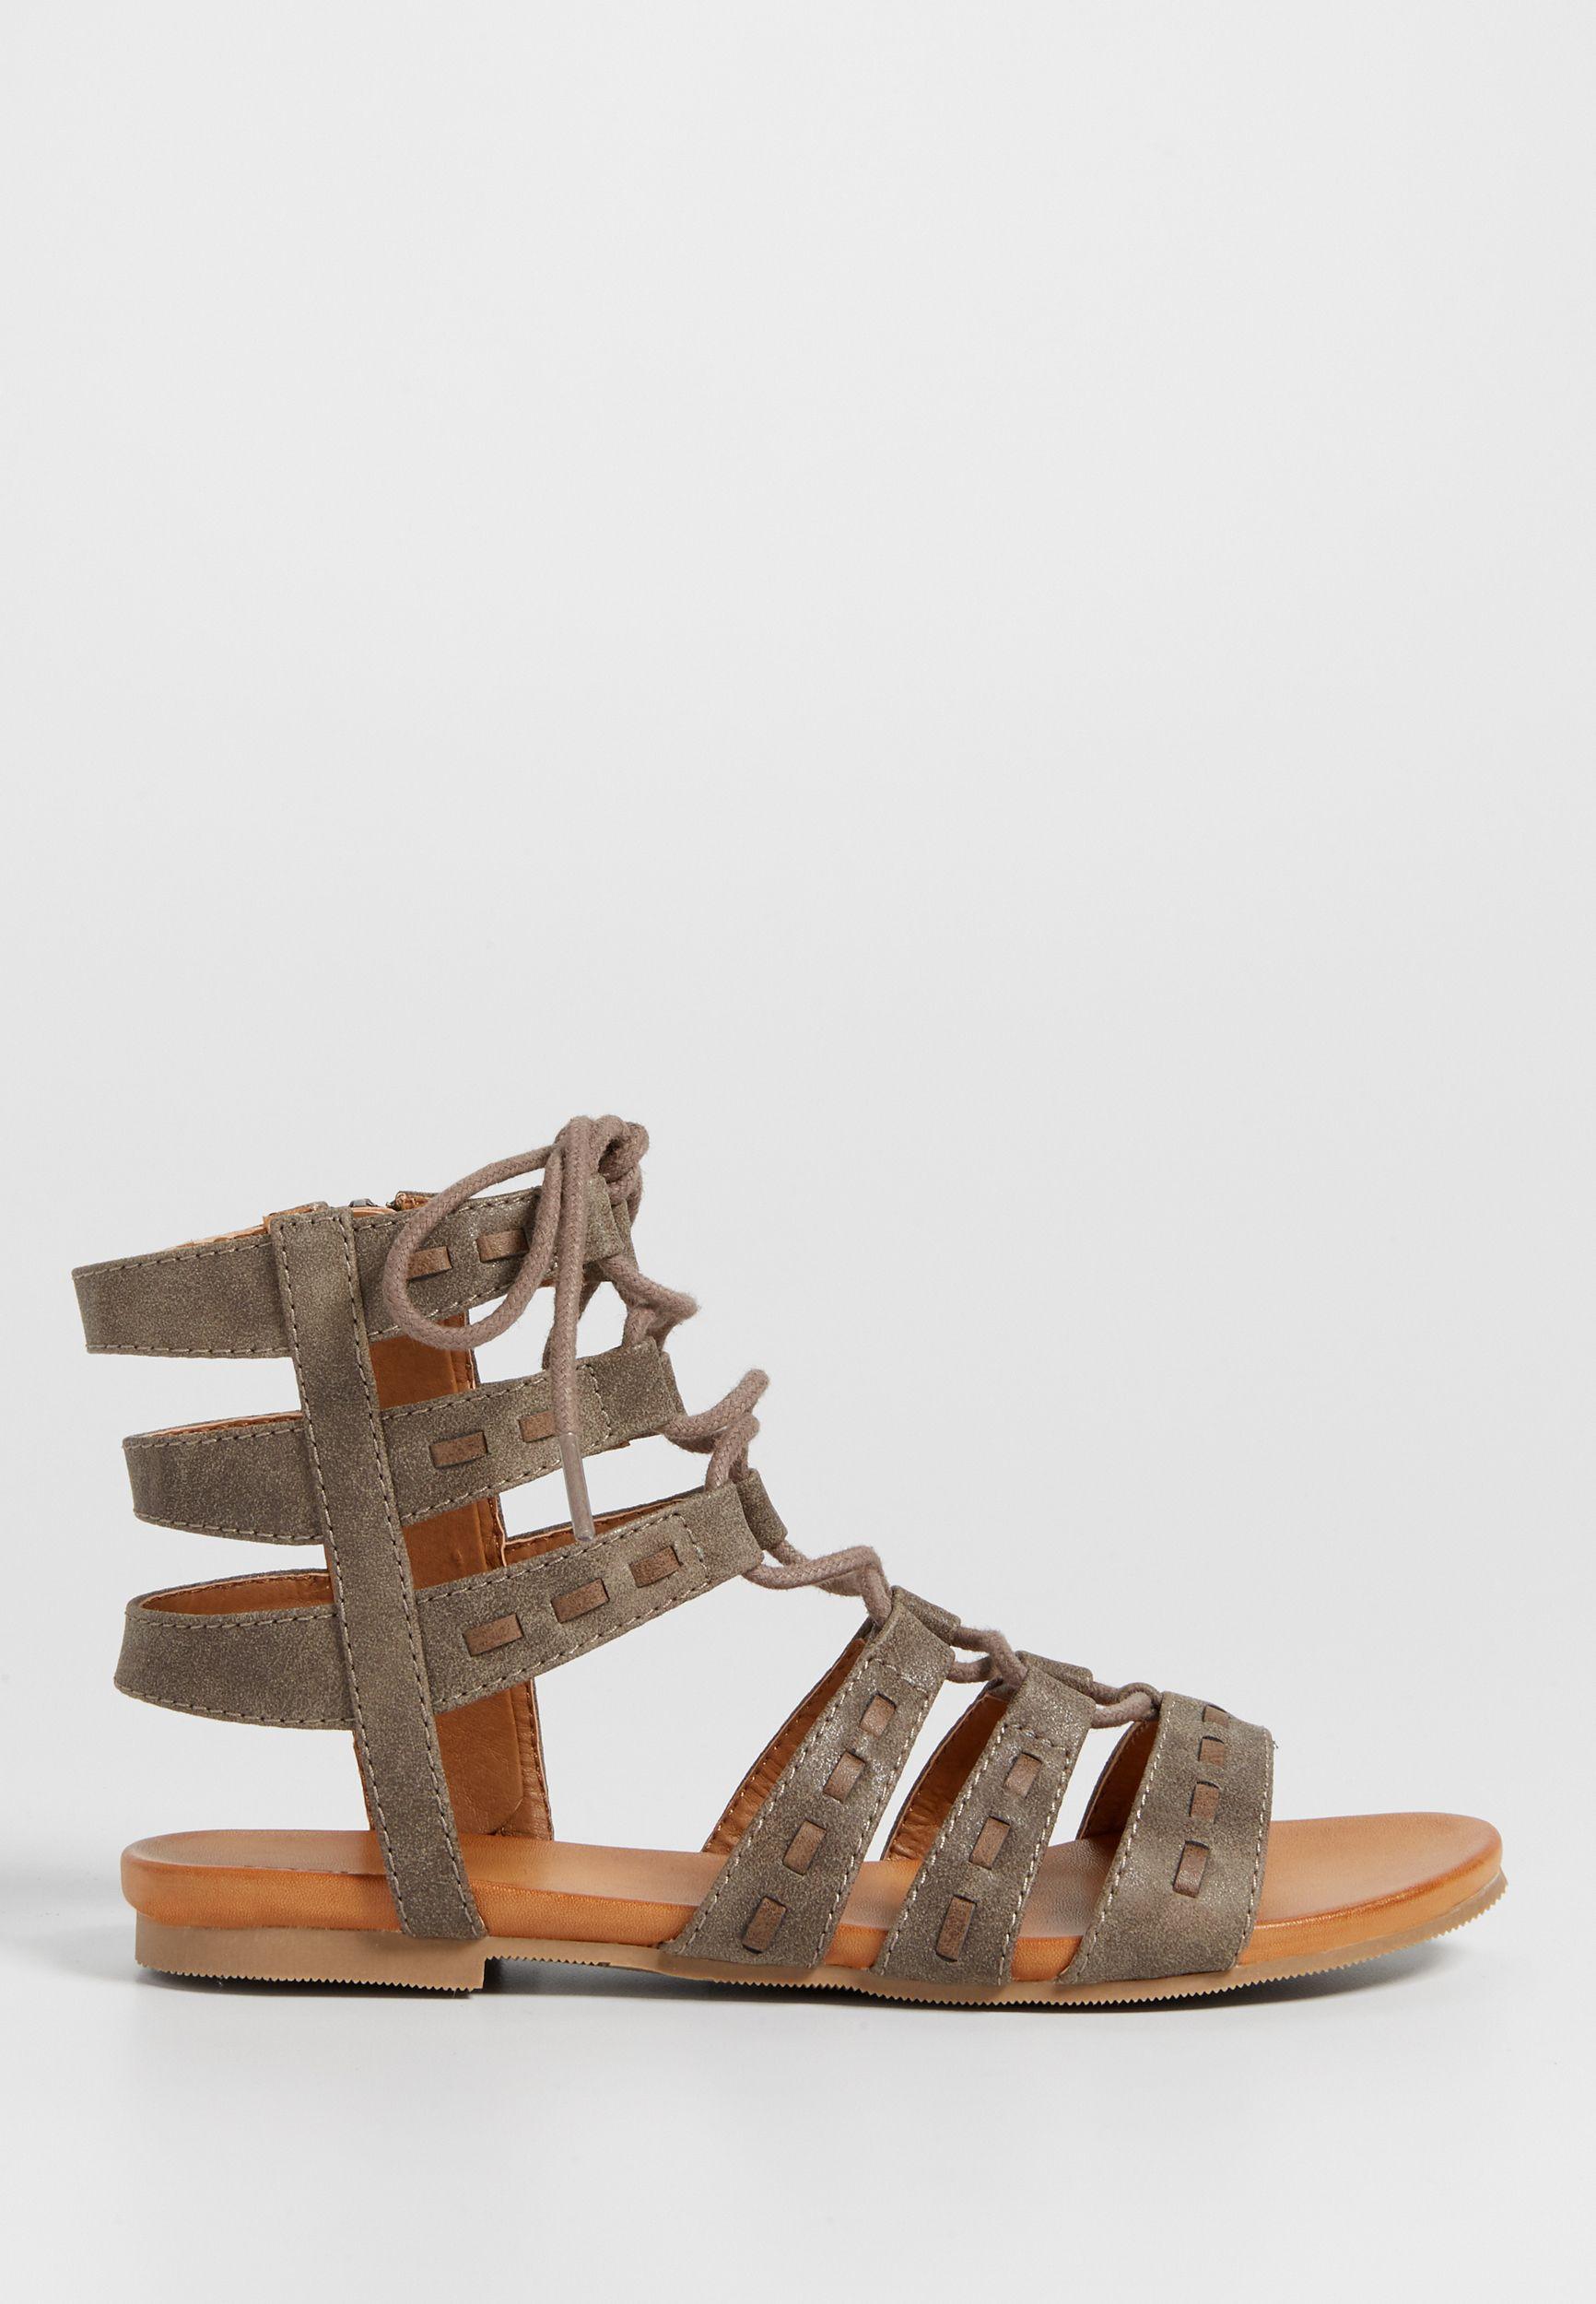 876a9b0c3c9e Elle lace up faux leather gladiator sandal (original price